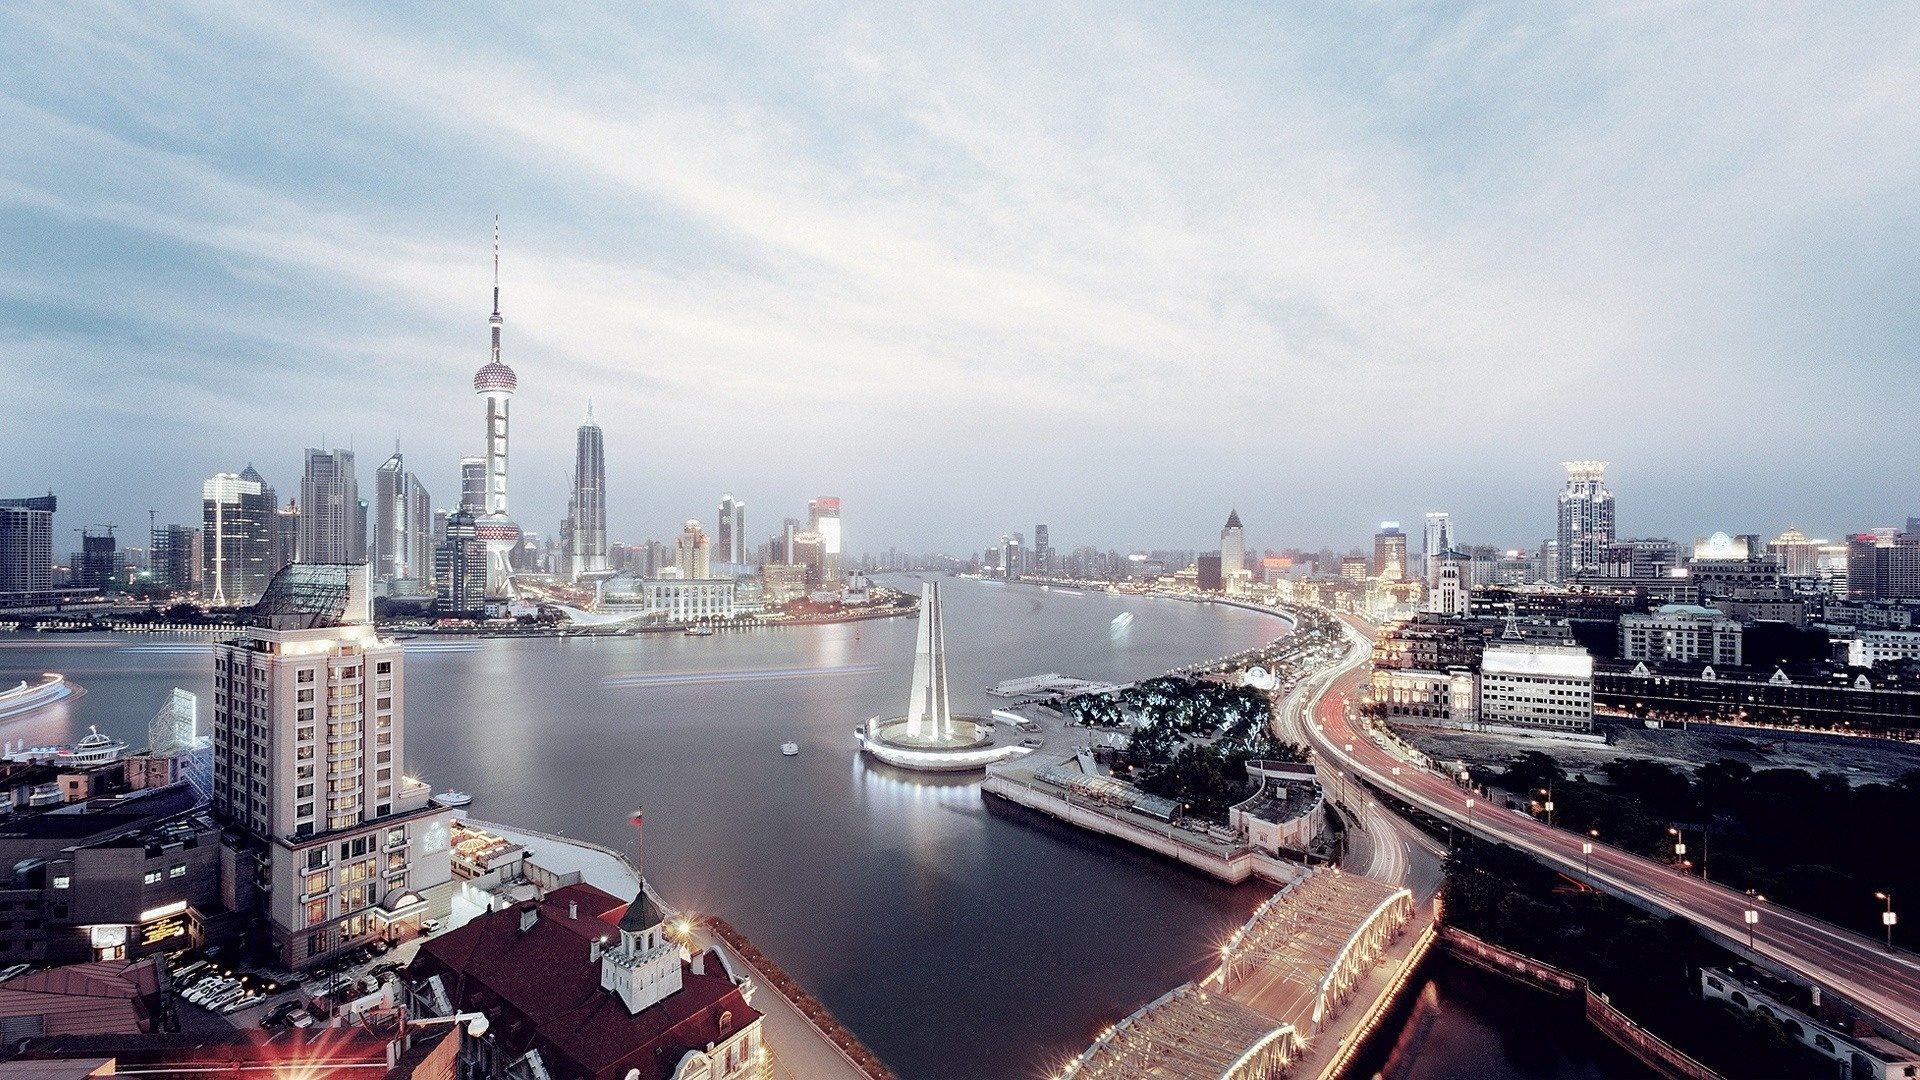 Shanghai Skyline Wallpaper HD Background 1920x1080